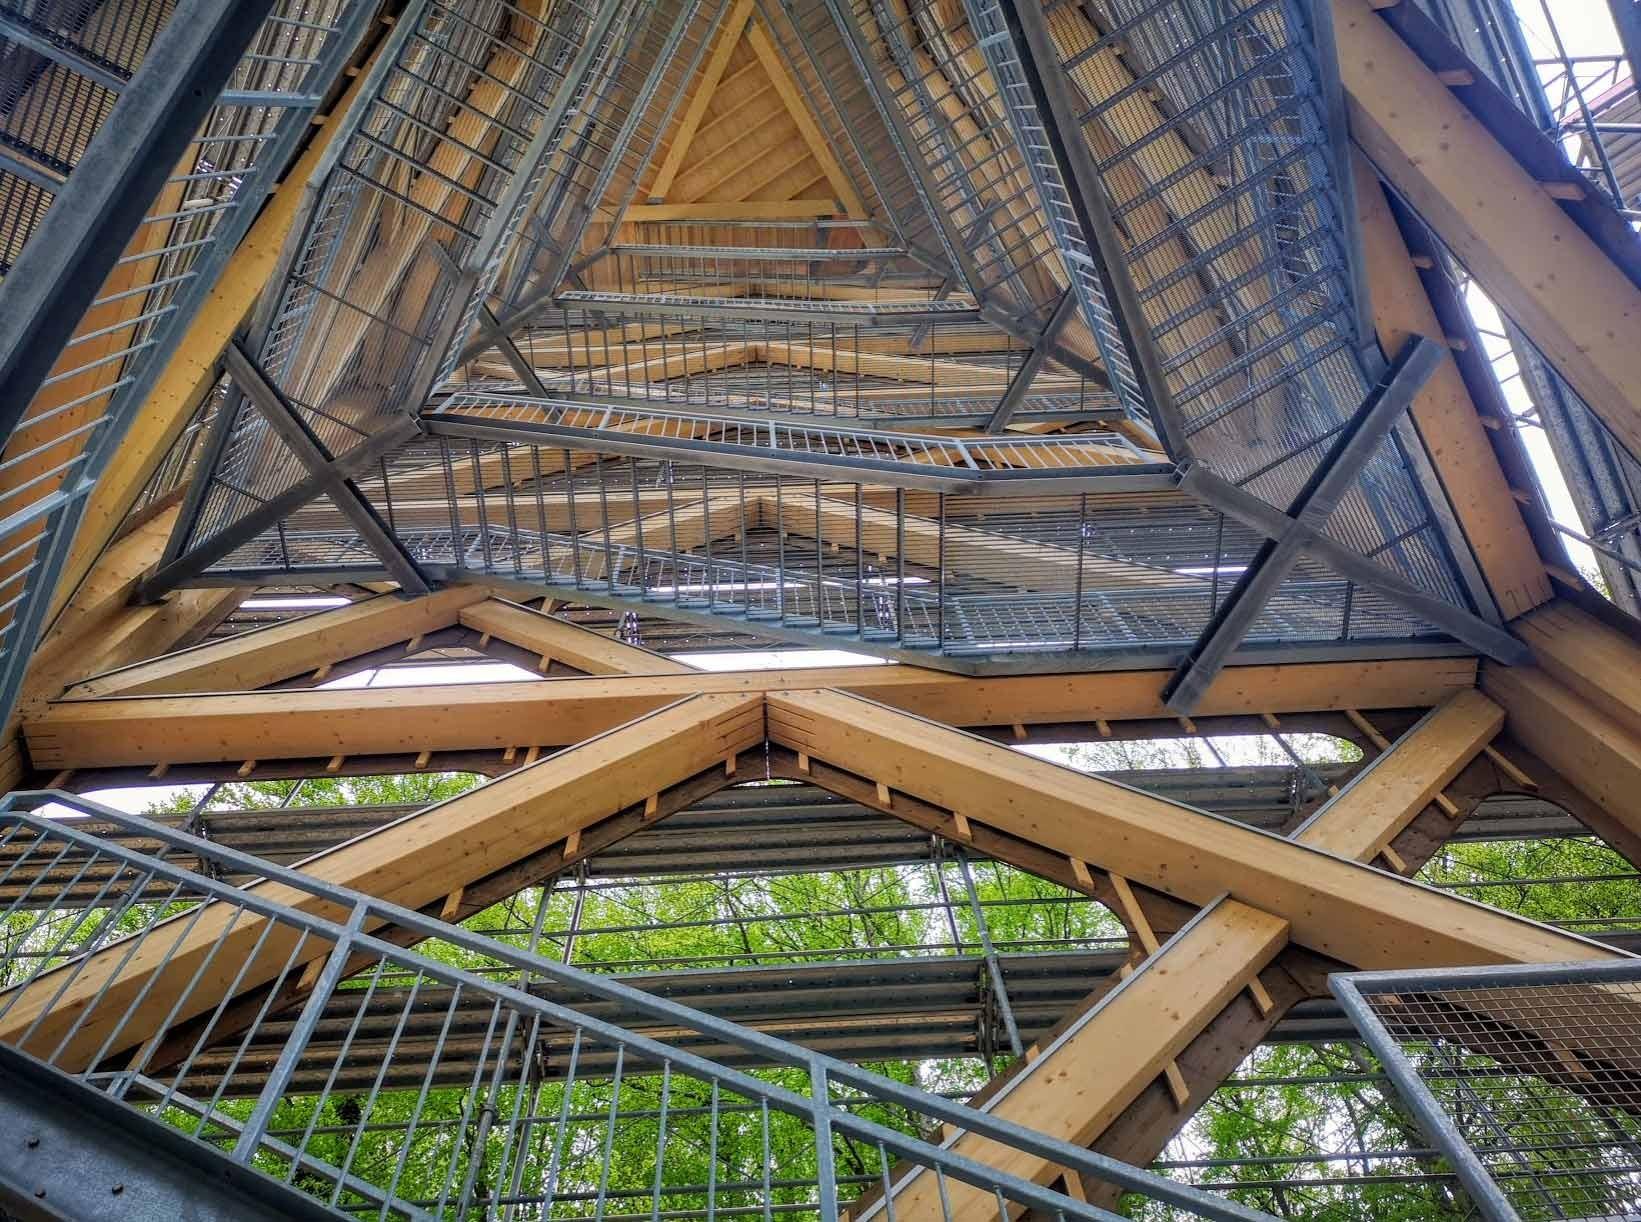 Innenraum des Hasenbergturms im Aargau